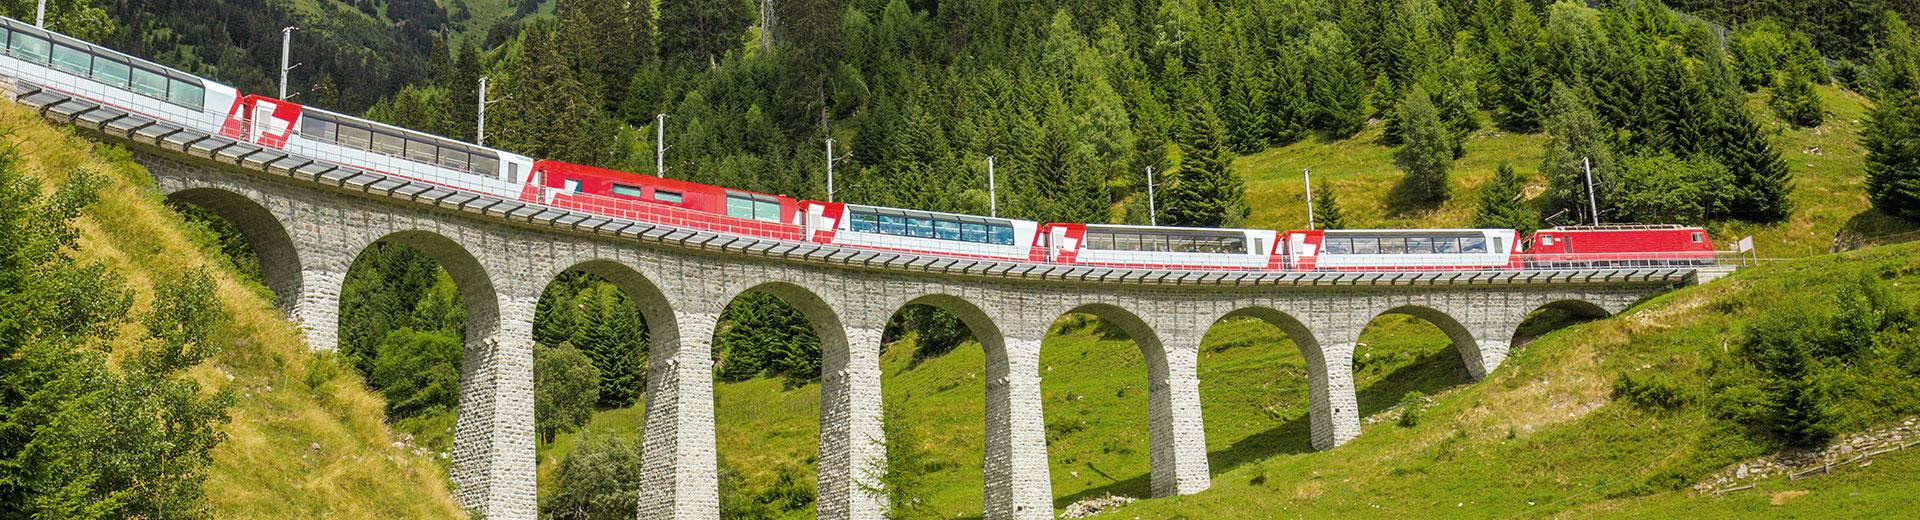 Glacier Express St. Moritz – Brig